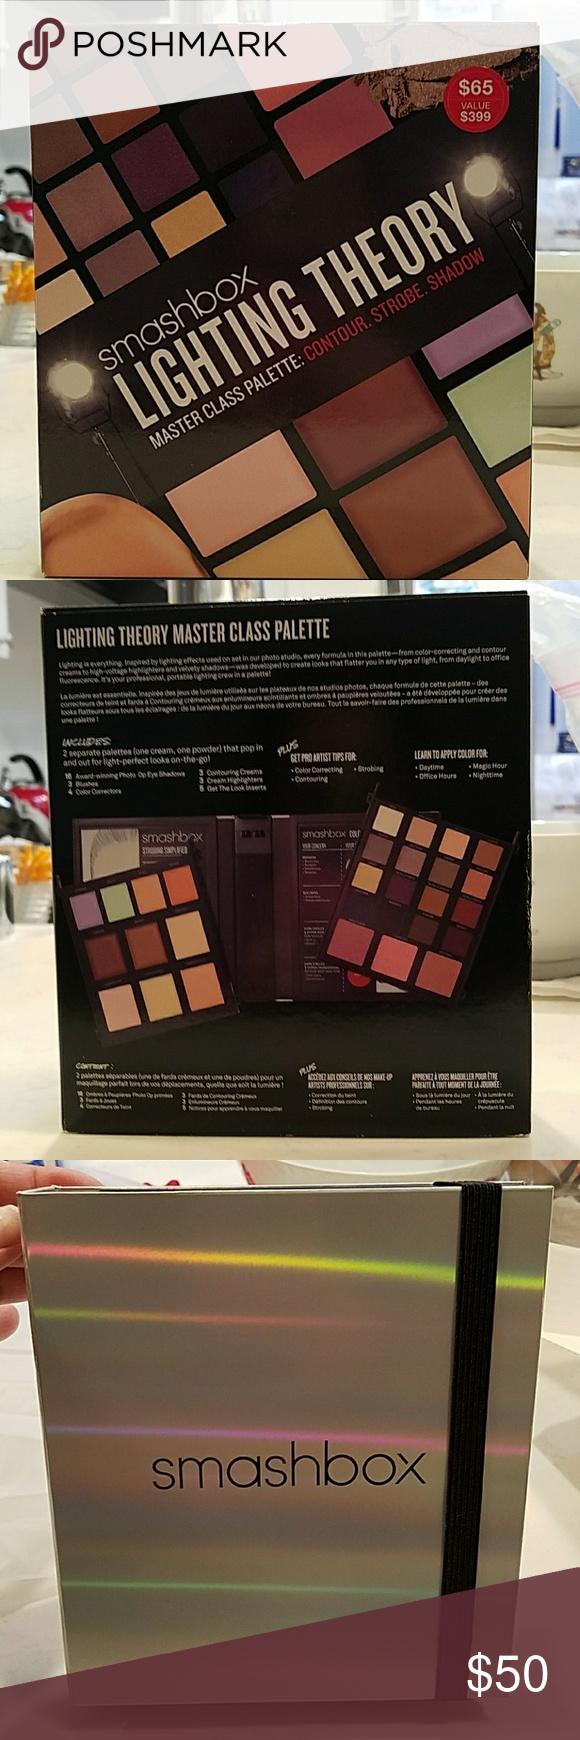 Smashbox Lightning Theory Palette NWT Sephora makeup